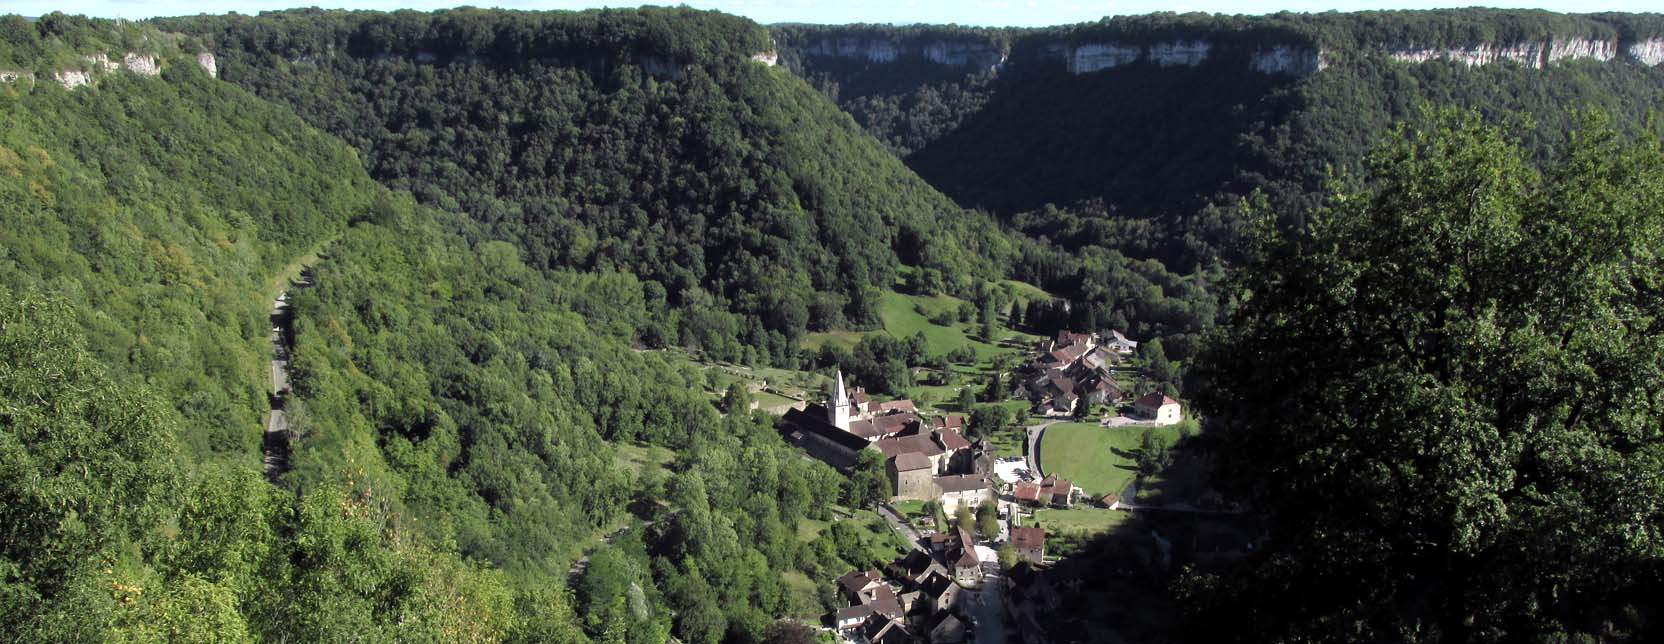 Site culturel et naturel exceptionnel